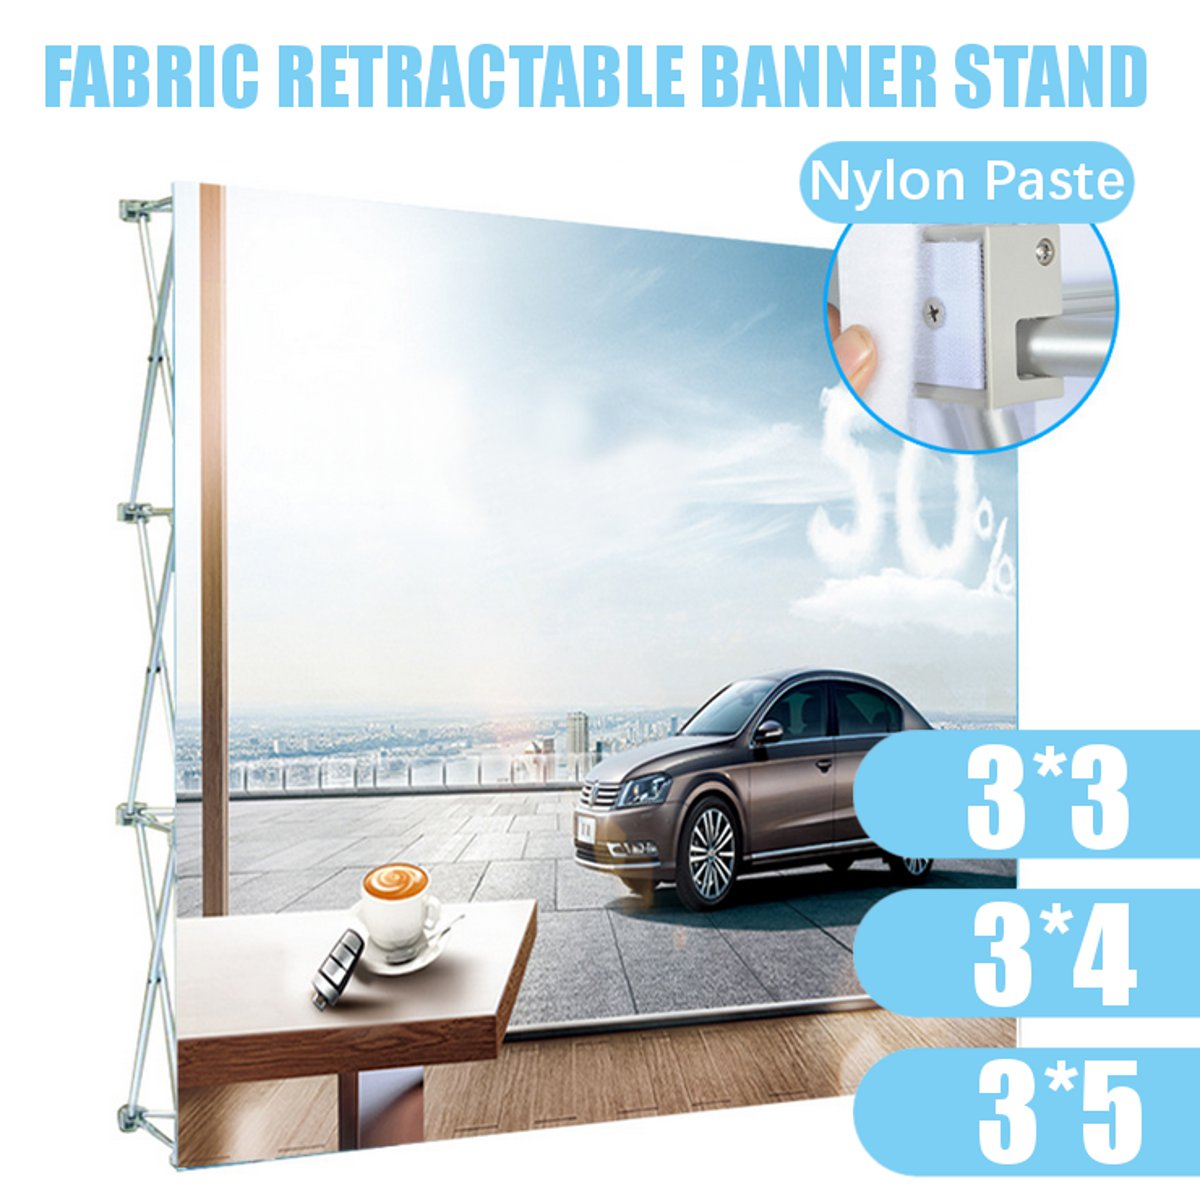 3*3 3*4 3*5 Aluminum Alloy Retractable Banner Stand Presentation Rack Flower Wall Frame Holder Wedding Backdrop Decoration